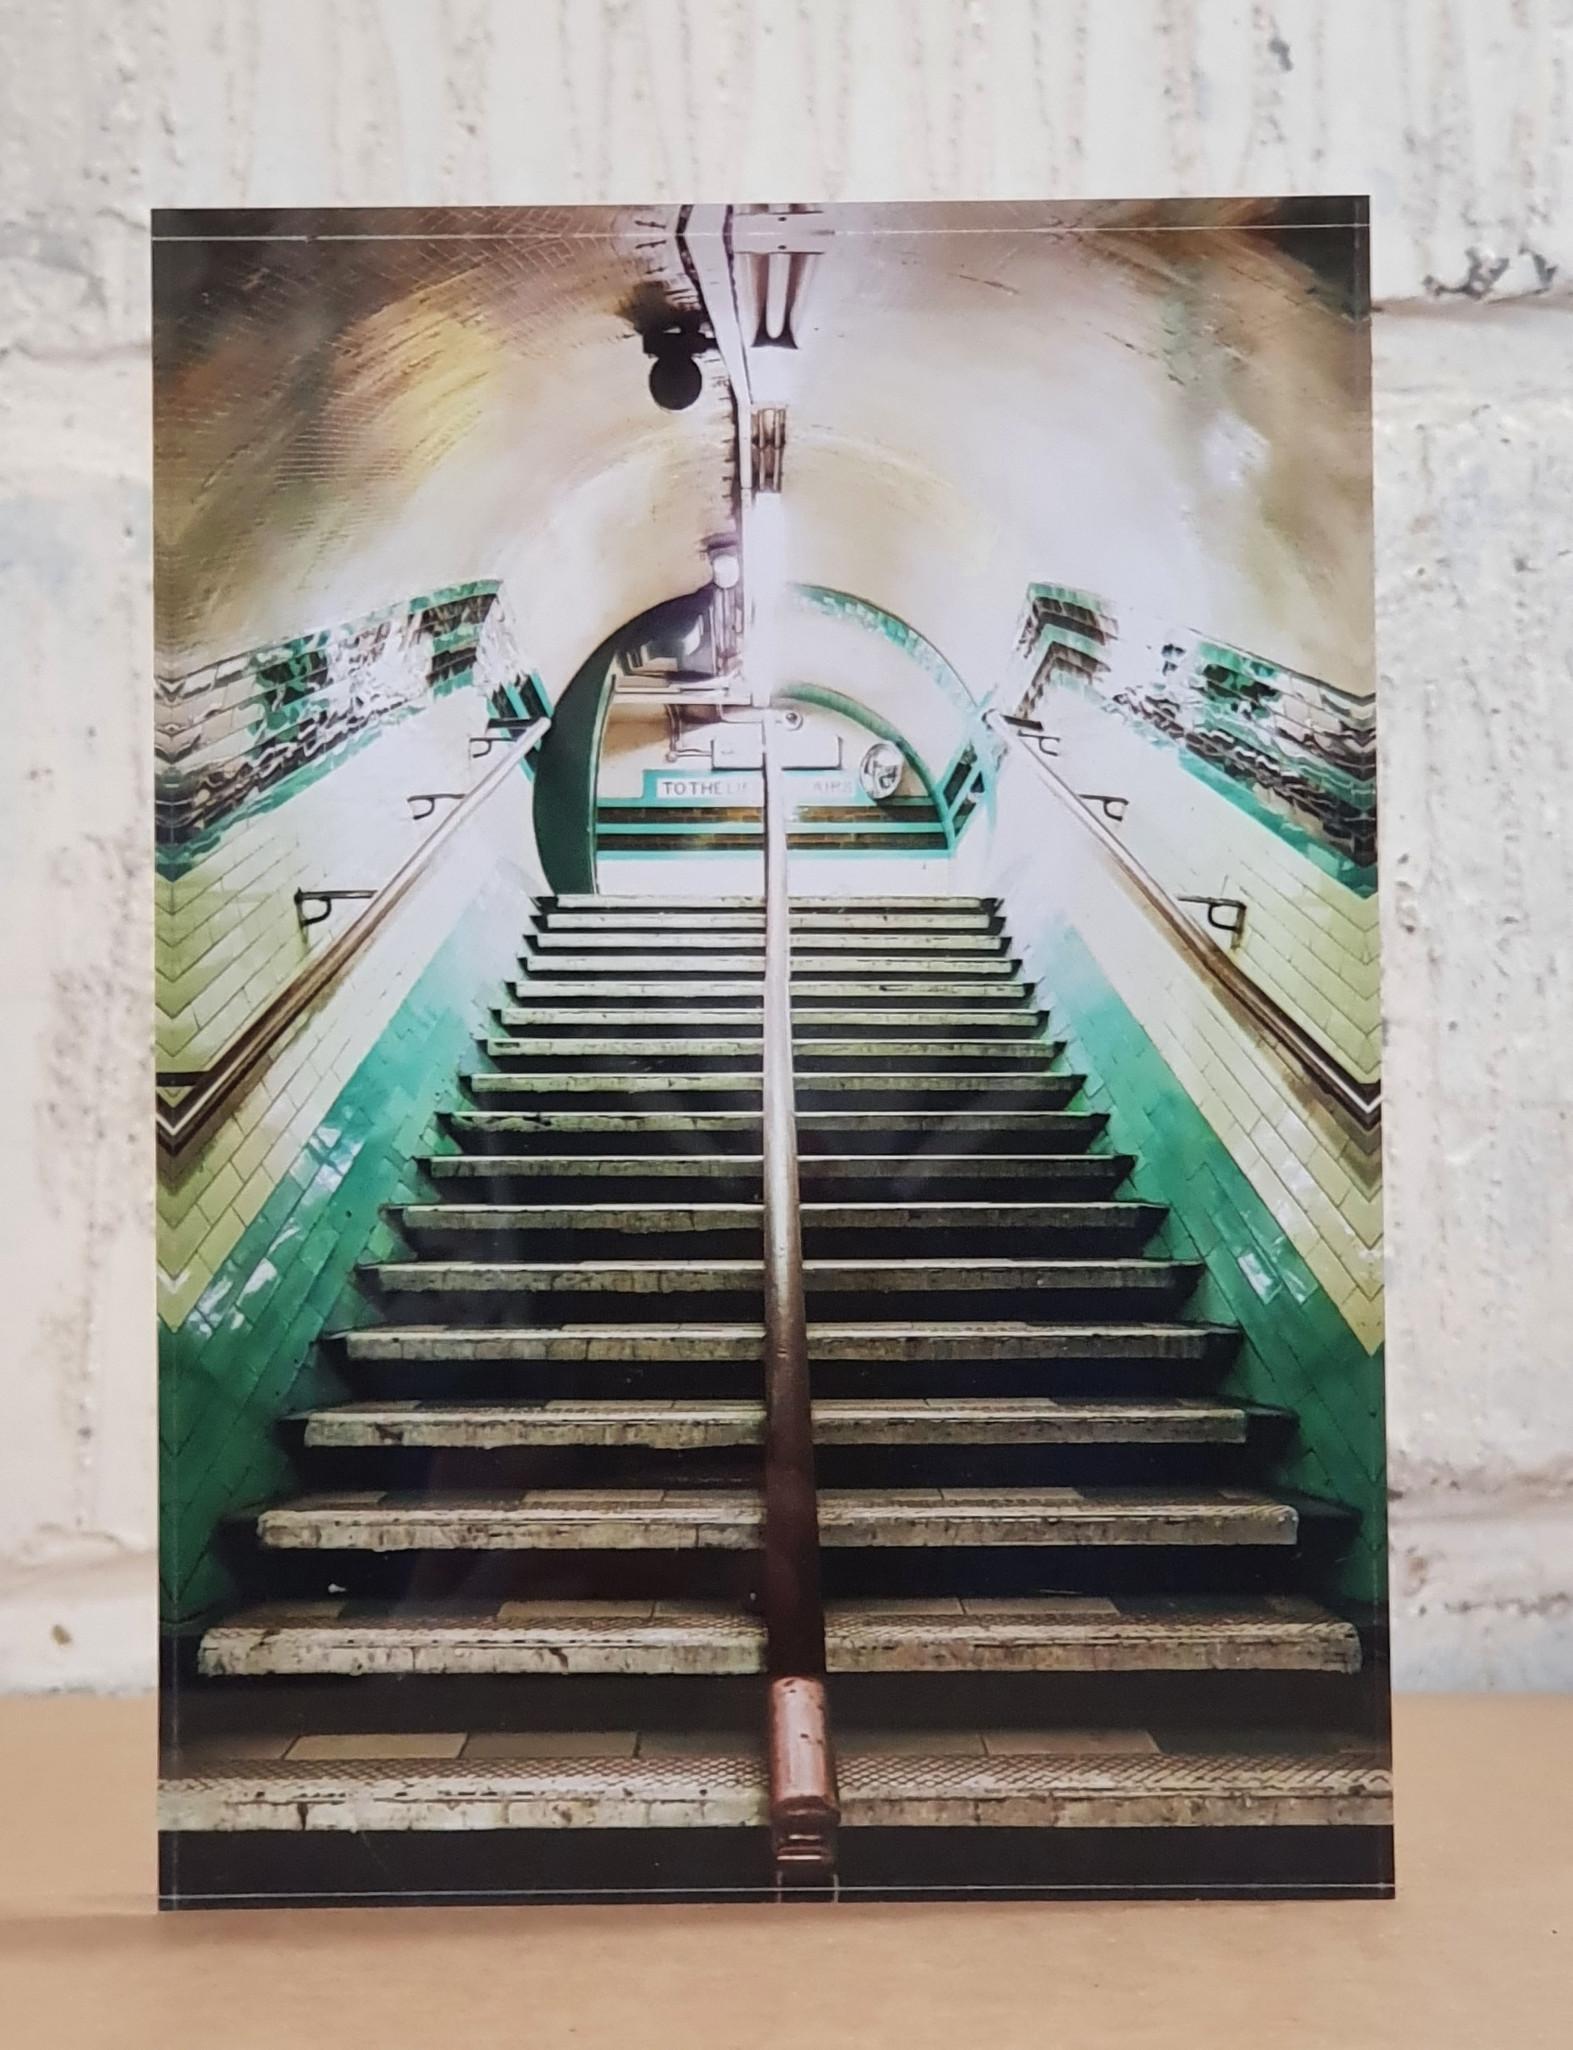 Regent S Park Underground Station Degreeart Com The Original Online Art Gallery